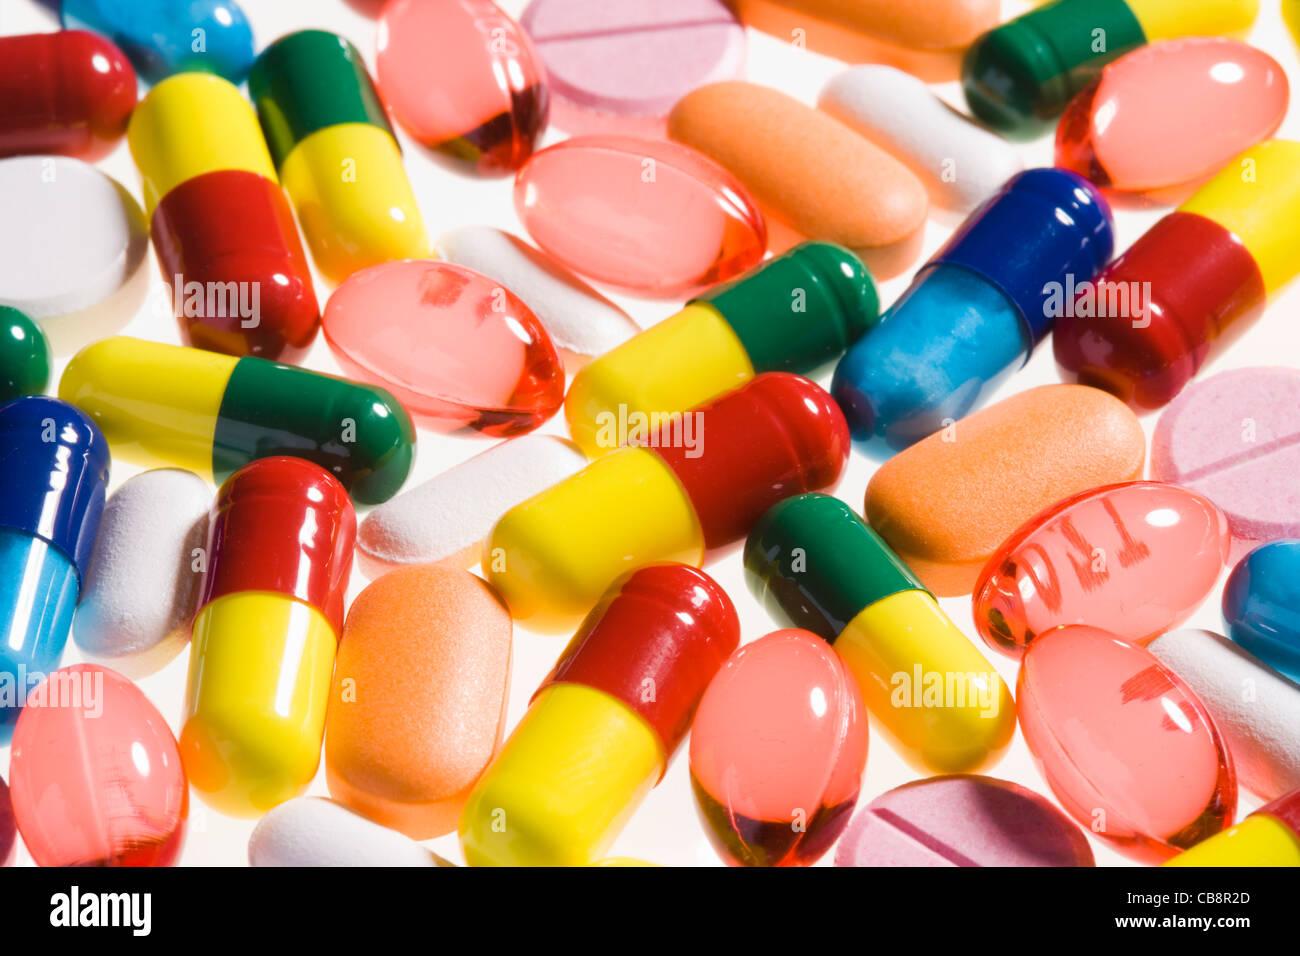 Pills. - Stock Image